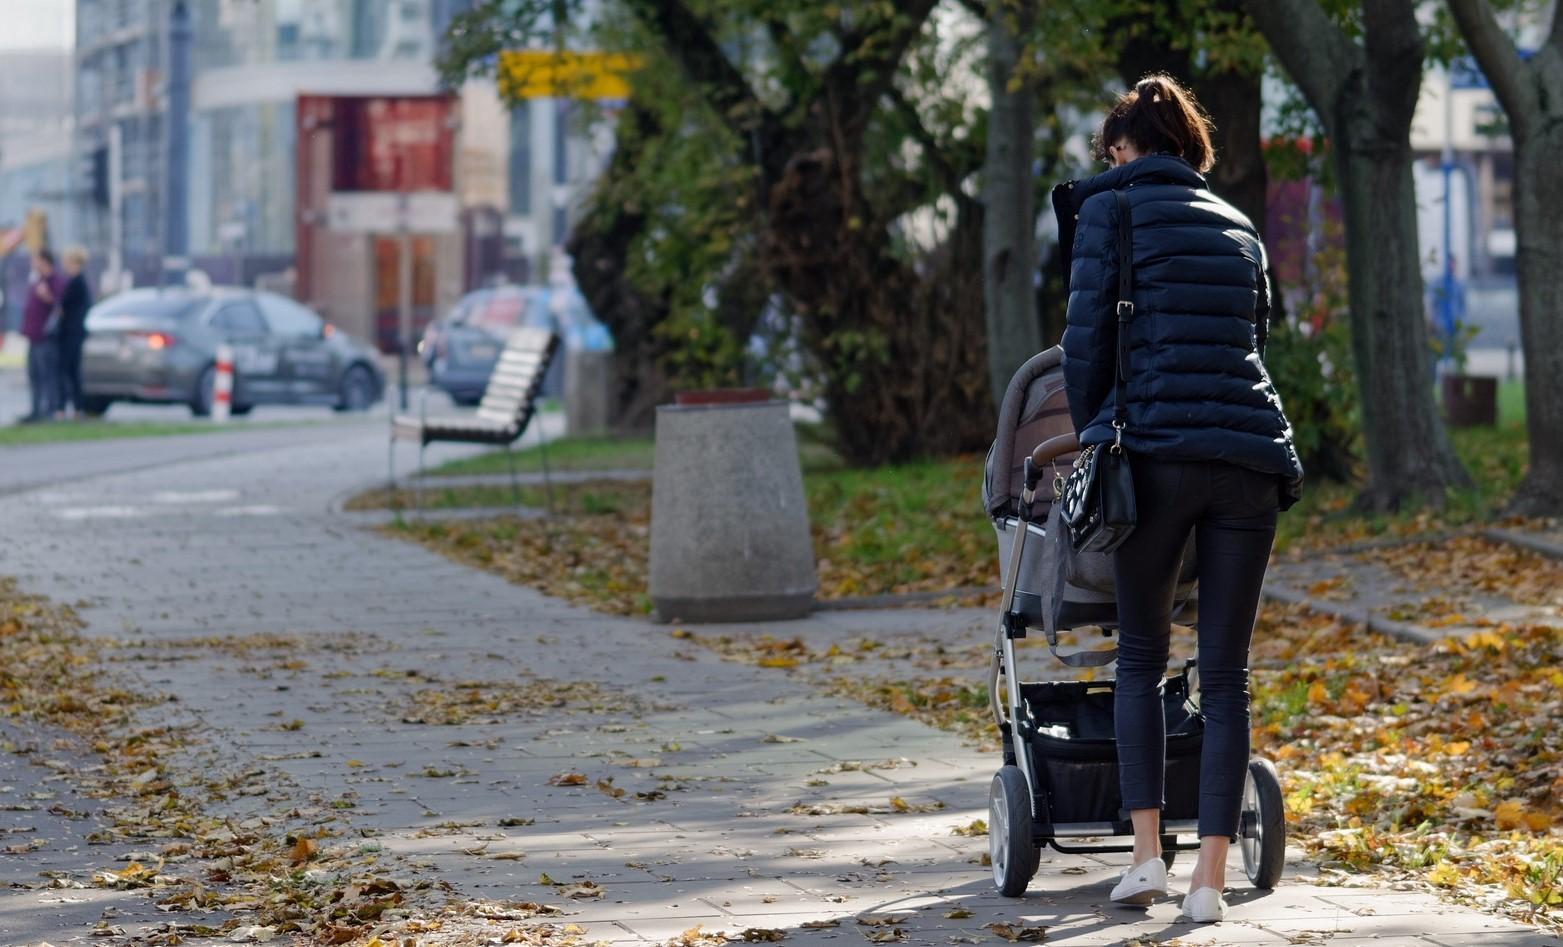 o mama care isi plimba bebelusul in carucior pe strada